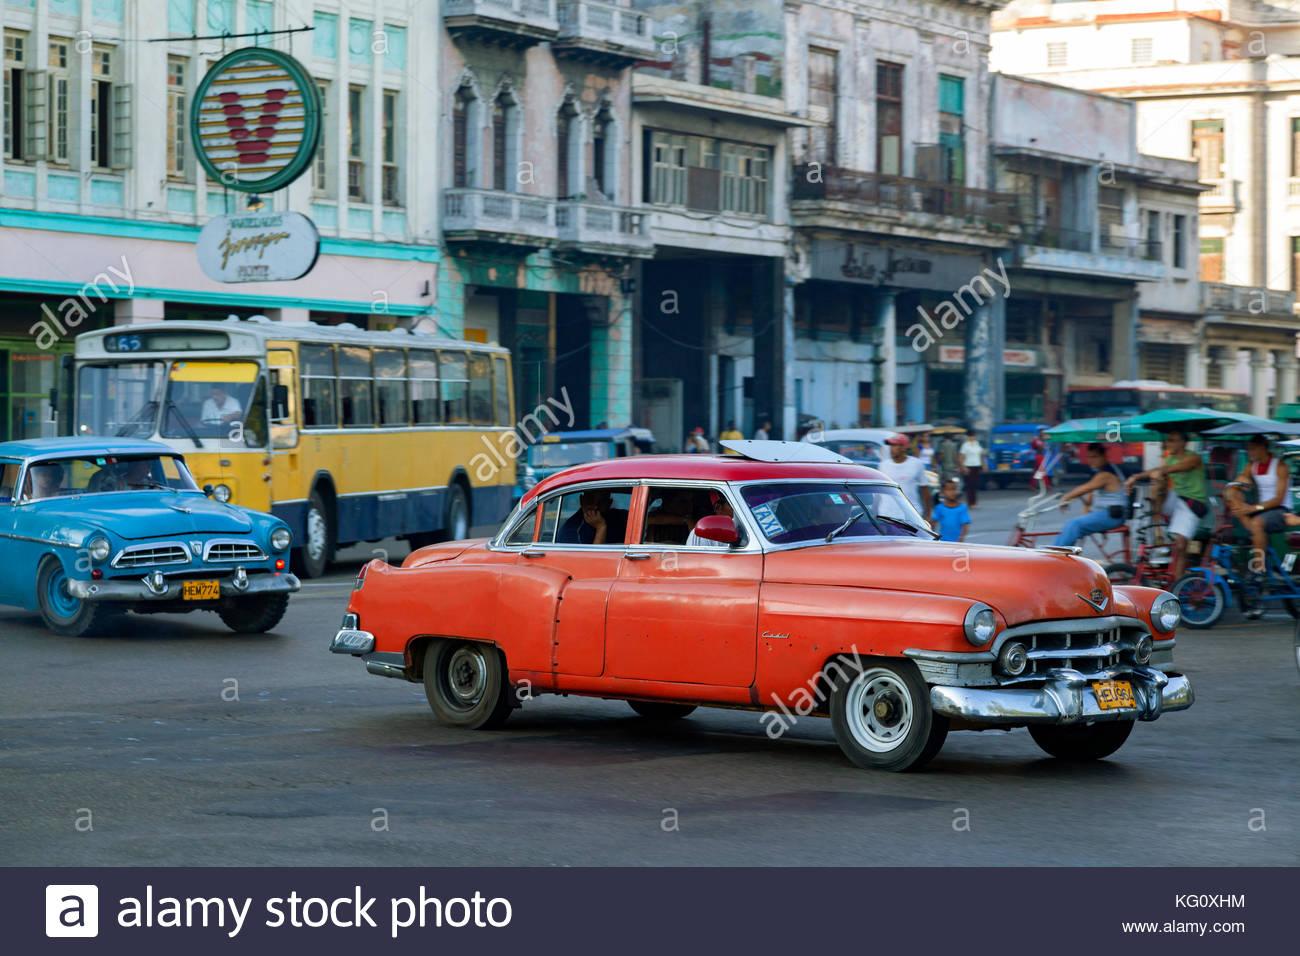 Oldtimer im Stadtteil Centro, Havanna, Kuba Engl.: Cuba, Havanna, Centro, american cars, taxi, cab, traffic, rush - Stock Image